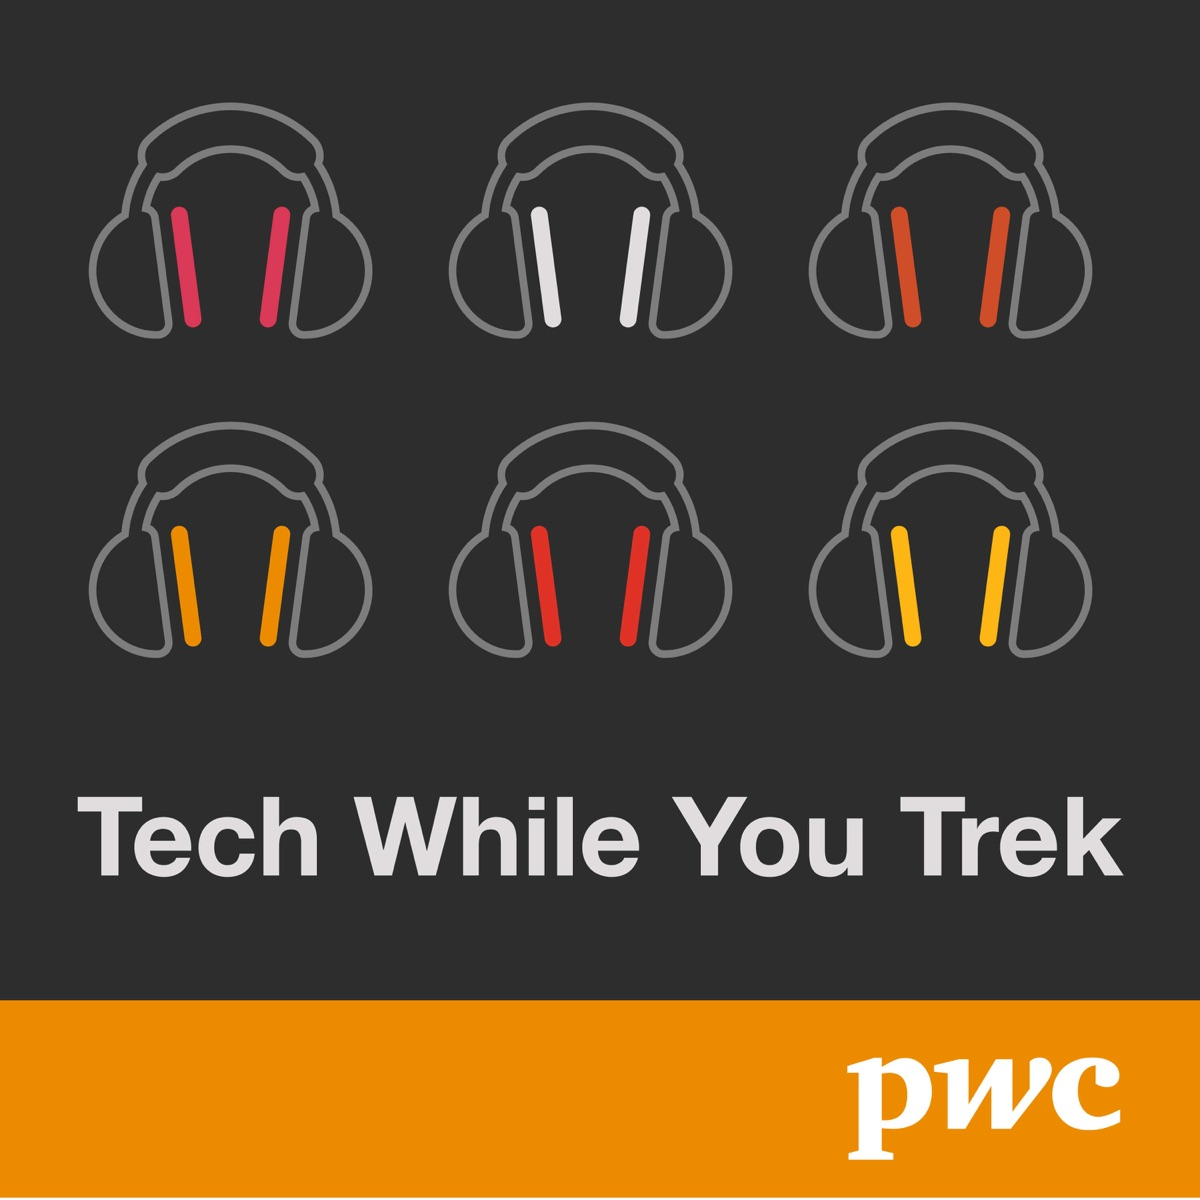 PwC's Tech While You Trek